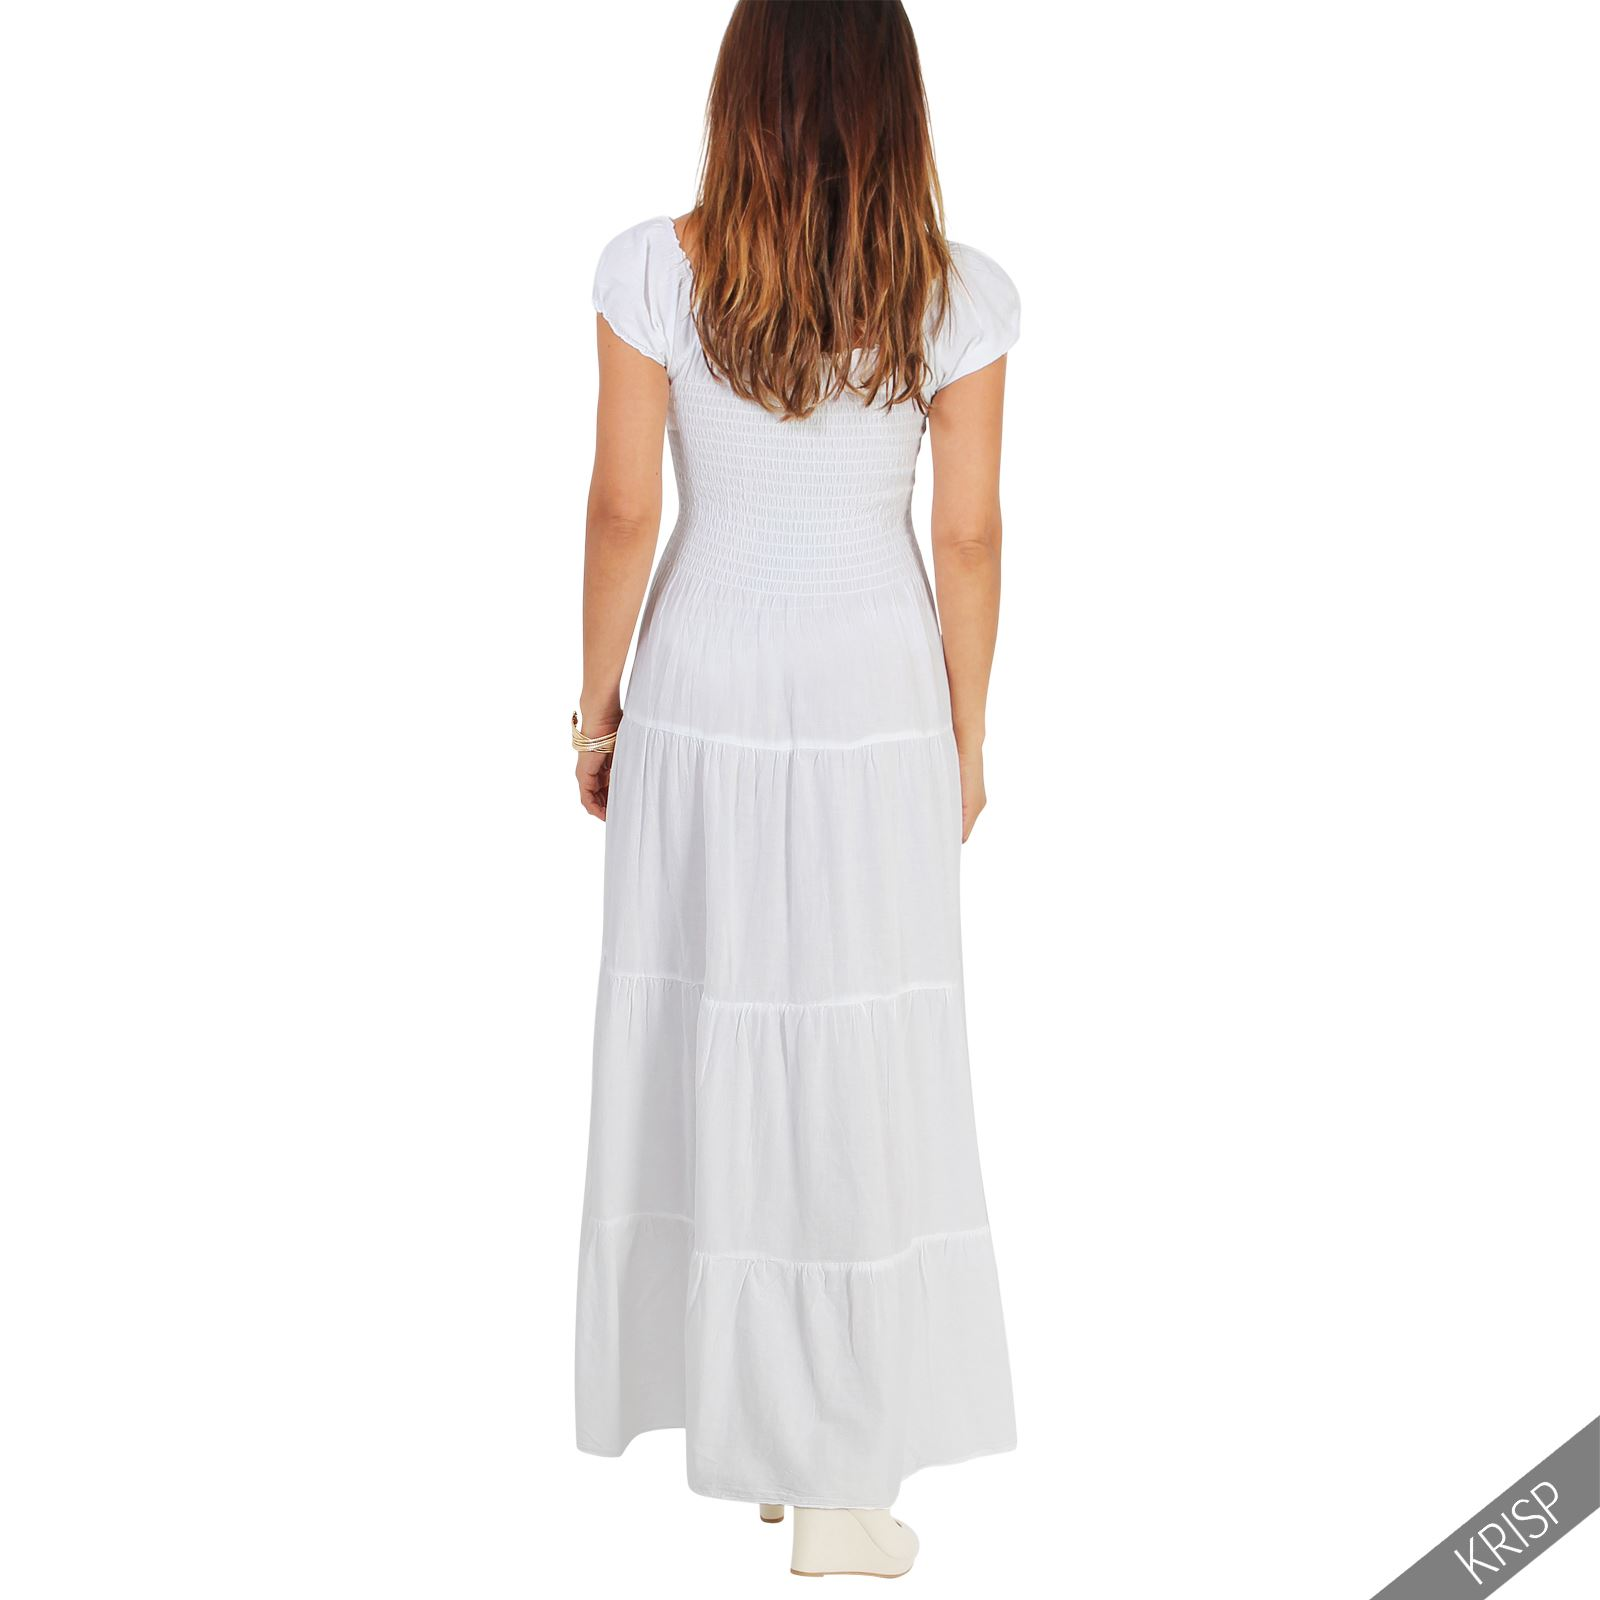 Damen Boho Maxi Kleid Einfarbig Bodenlang Baumwolle Sommer ...